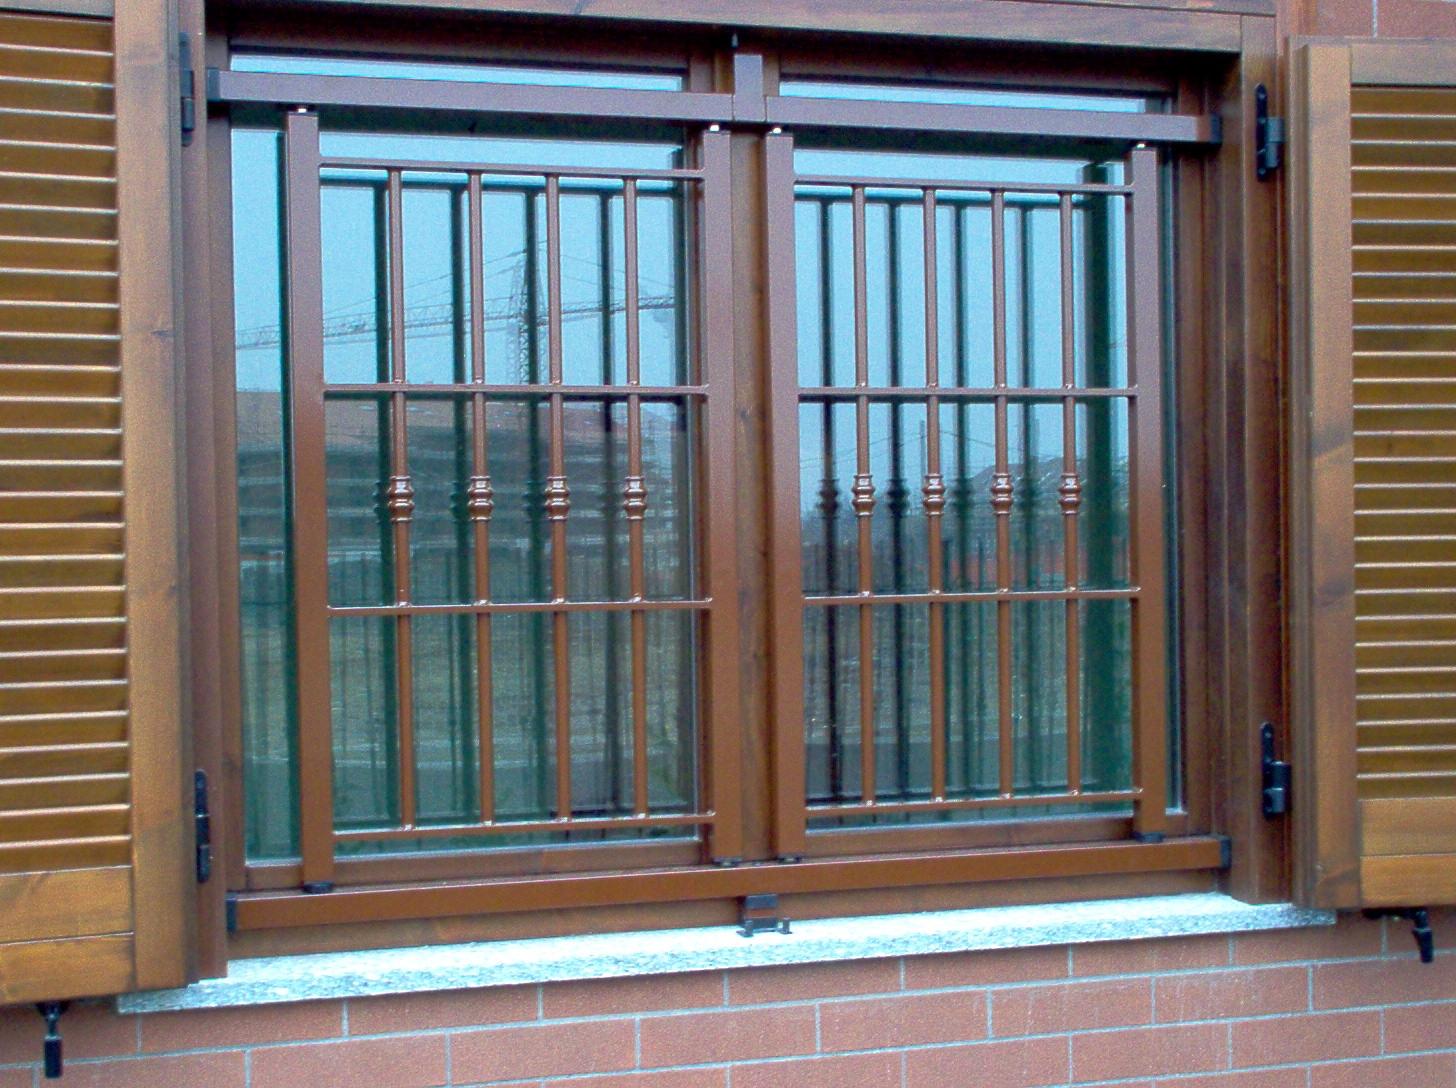 Grate in acciaio zincato blokka - Grate per finestre a scomparsa ...